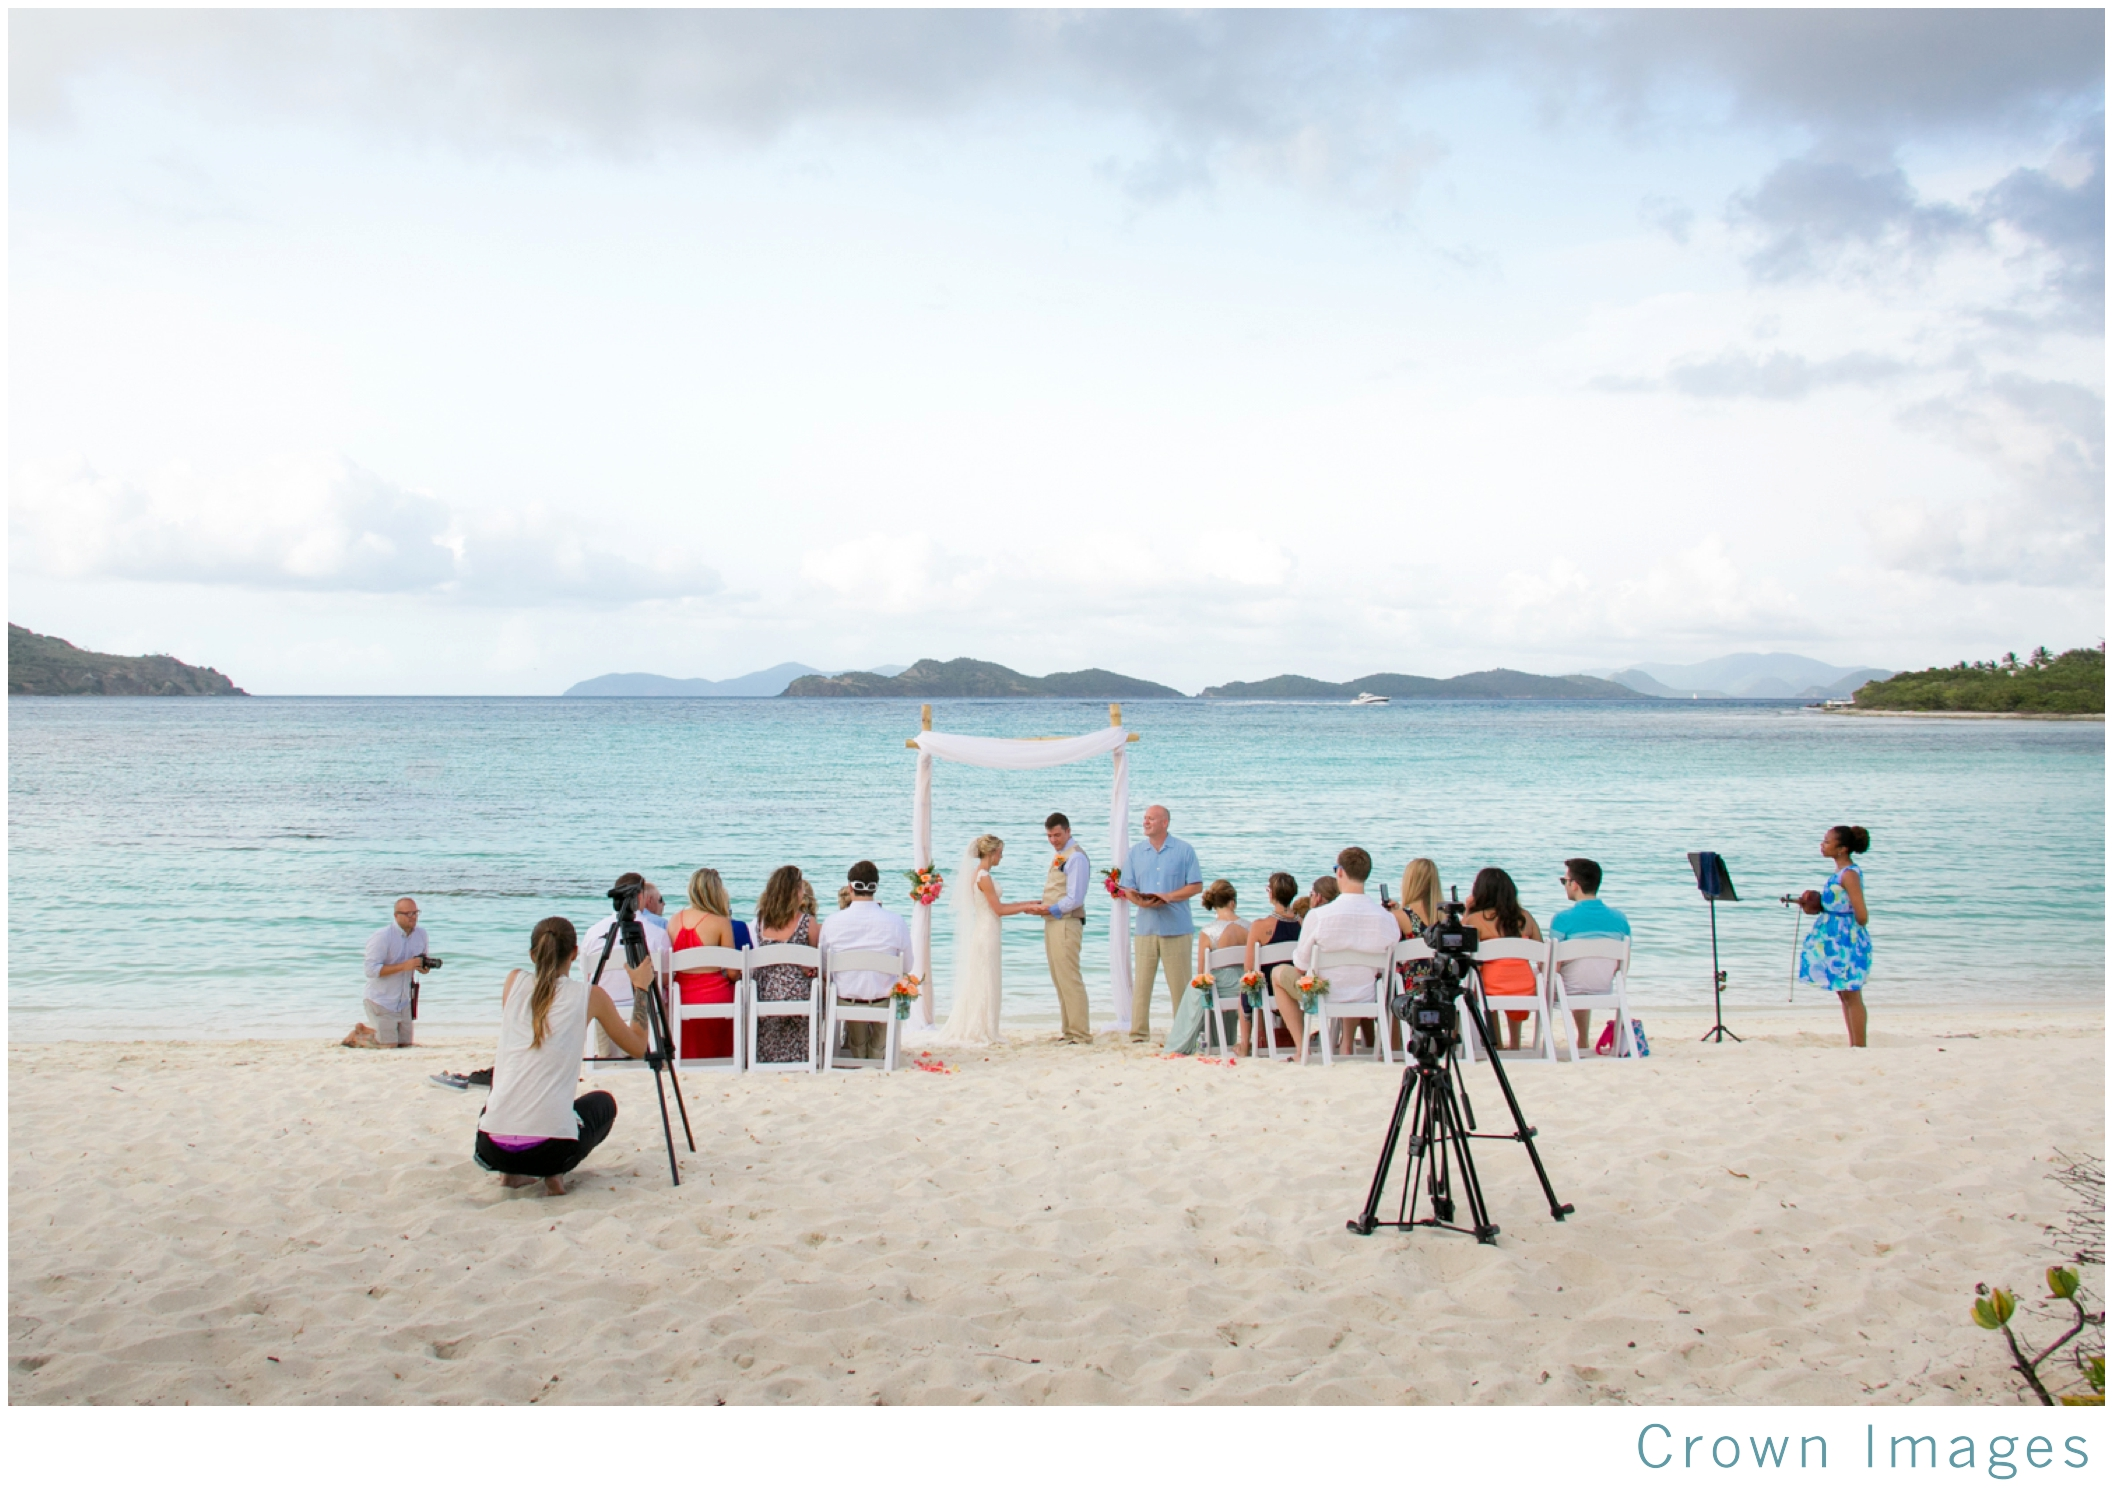 st thomas beach wedding photos_1568.jpg